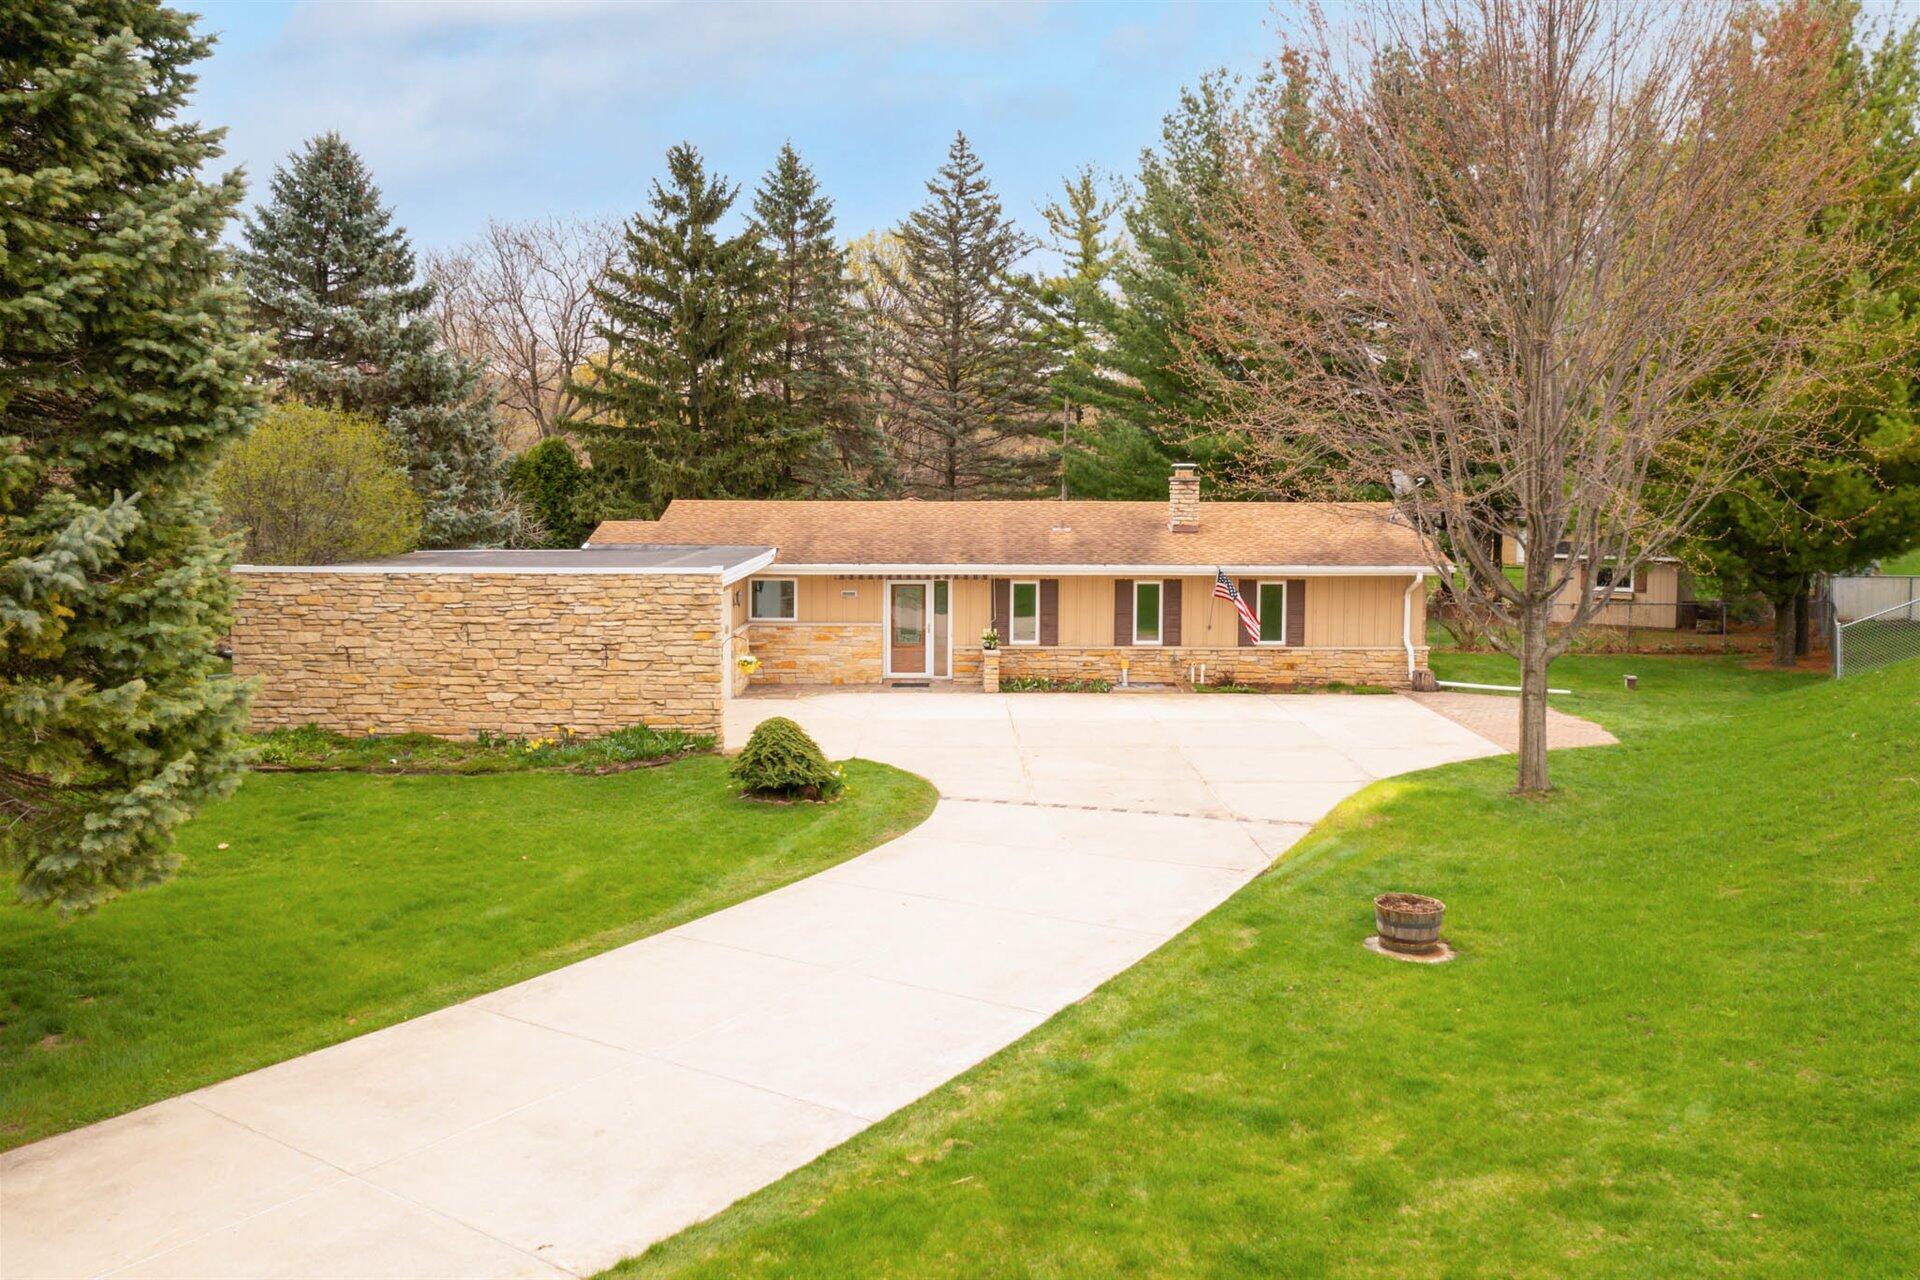 20205 Scarlet Hawthorne Rd, Brookfield, Wisconsin 53045, 3 Bedrooms Bedrooms, 8 Rooms Rooms,2 BathroomsBathrooms,Single-Family,For Sale,Scarlet Hawthorne Rd,1735393